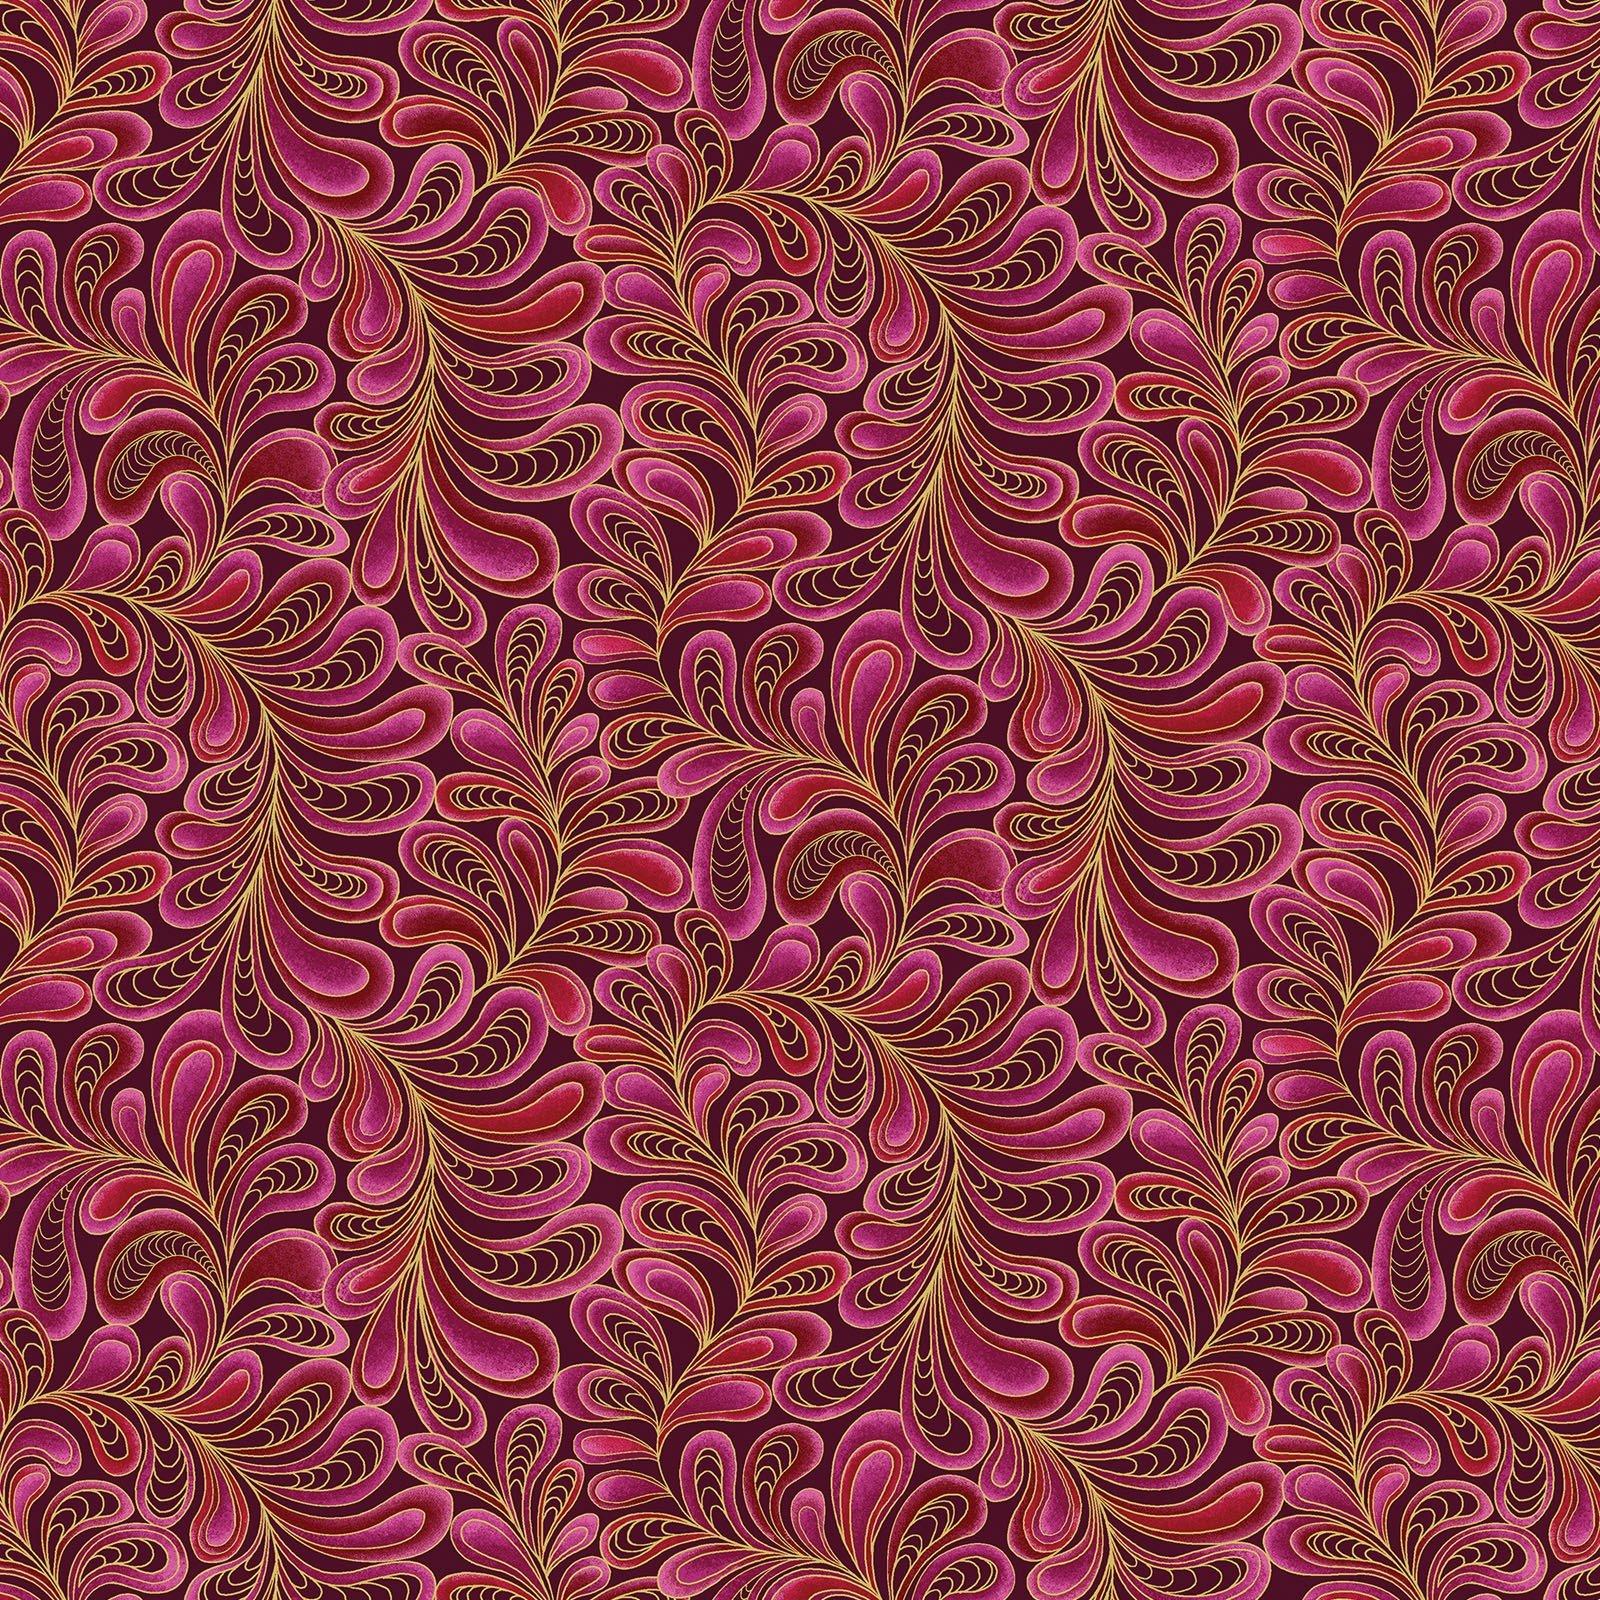 CAT-I-TUDE - Feather Frolic -Raspberry